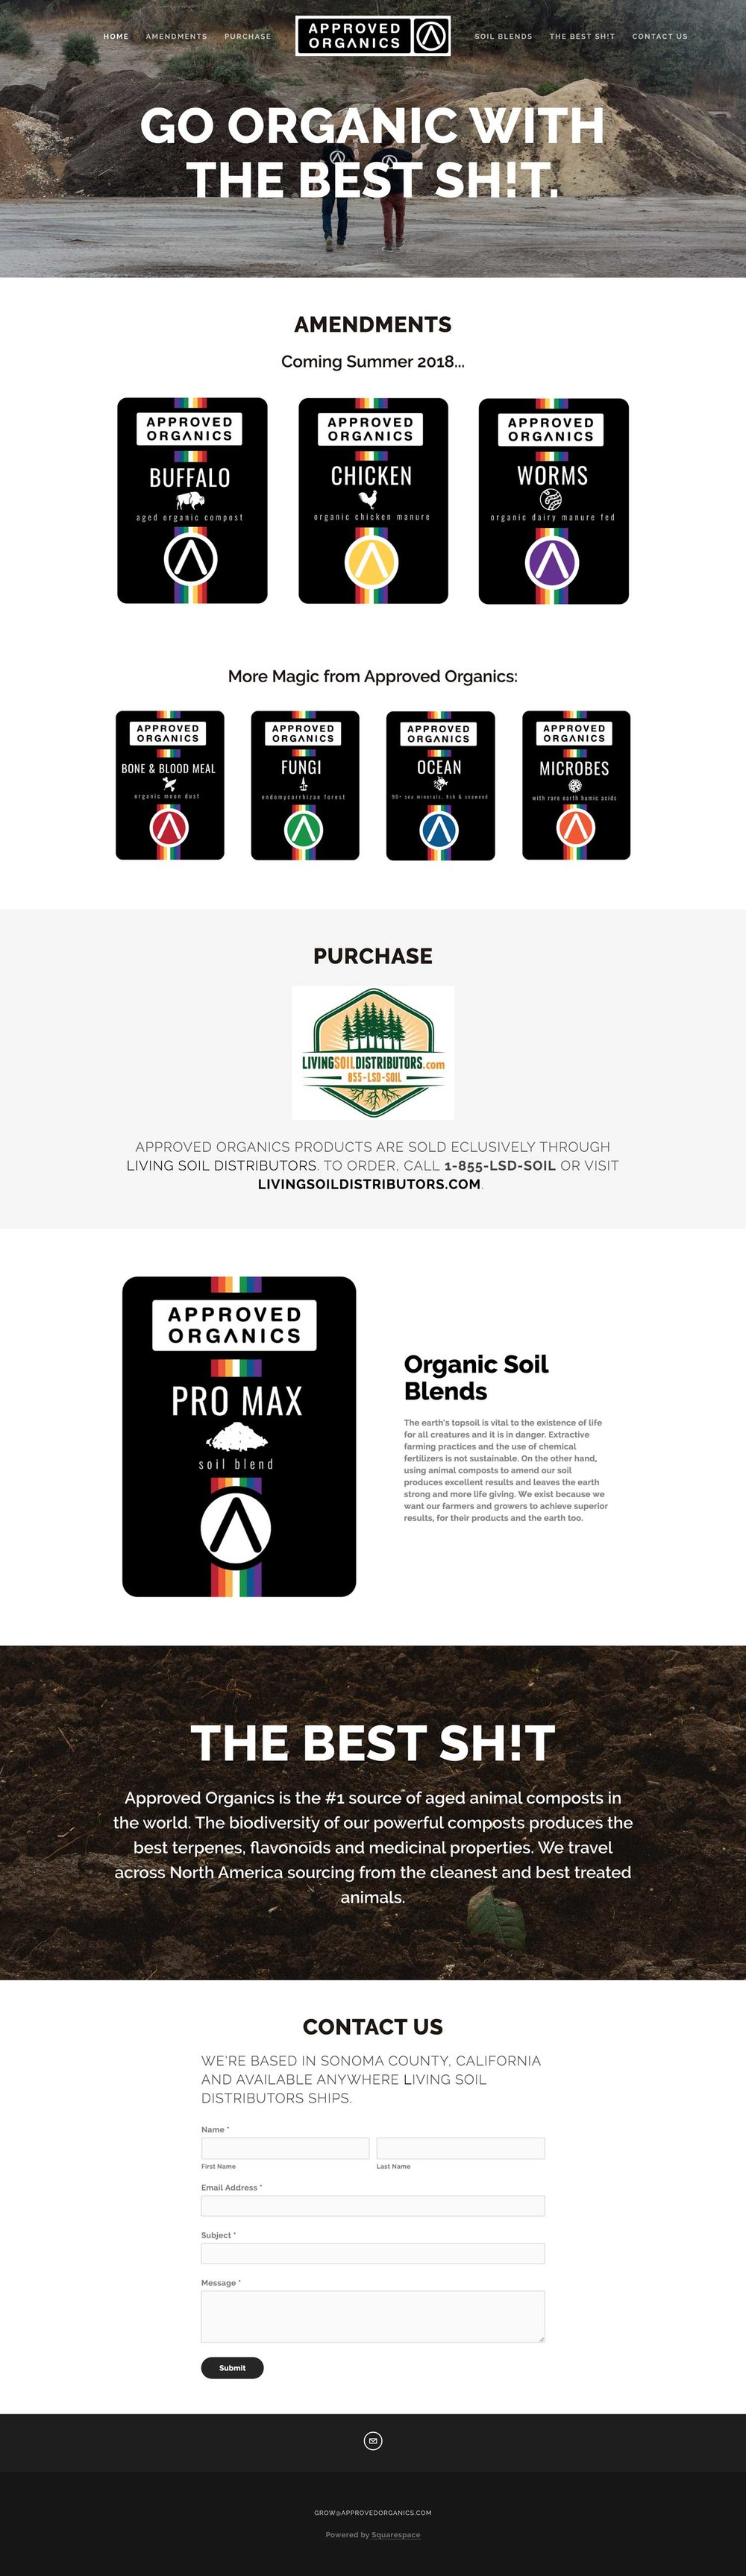 Approved Organics